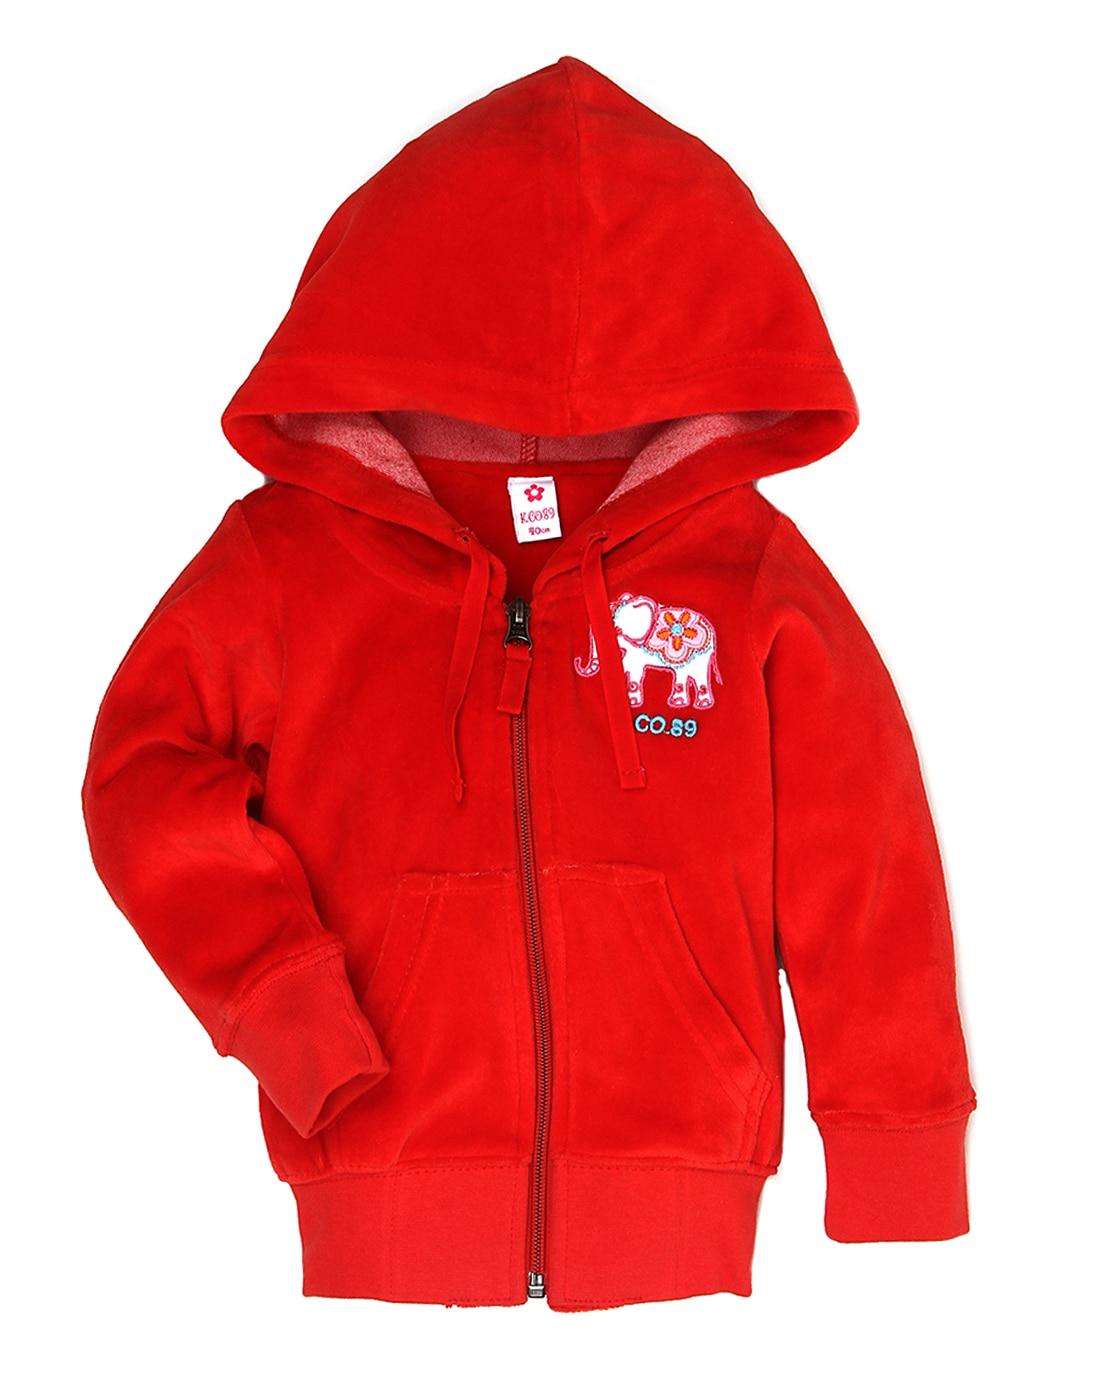 K.C.O 89 Girls Red Solid Sweat Shirt